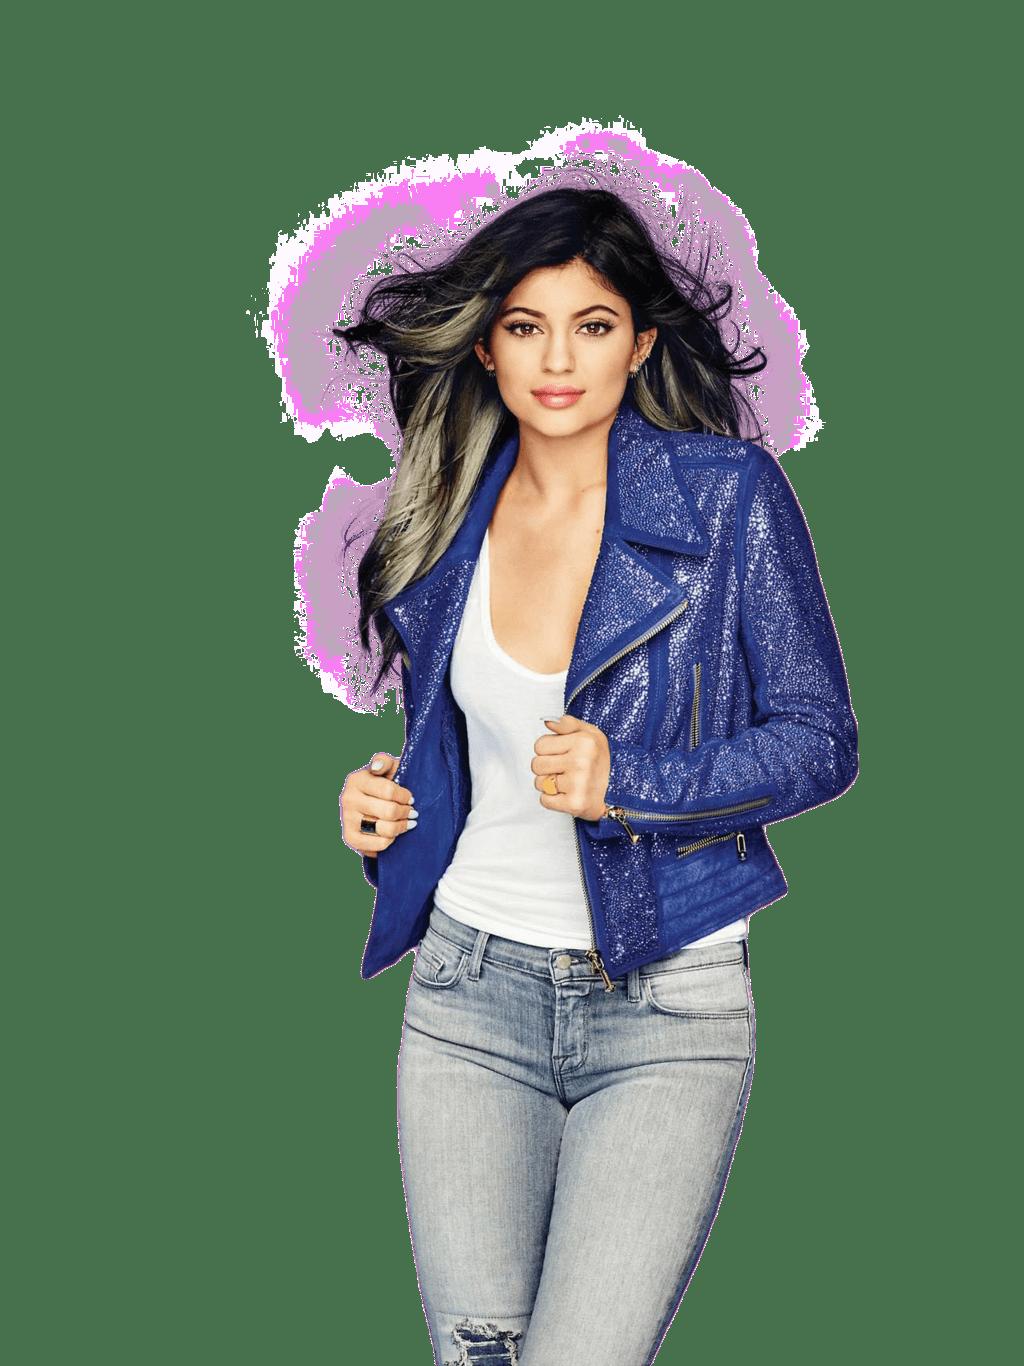 Kylie Jenner Glitter Shirt PNG Image